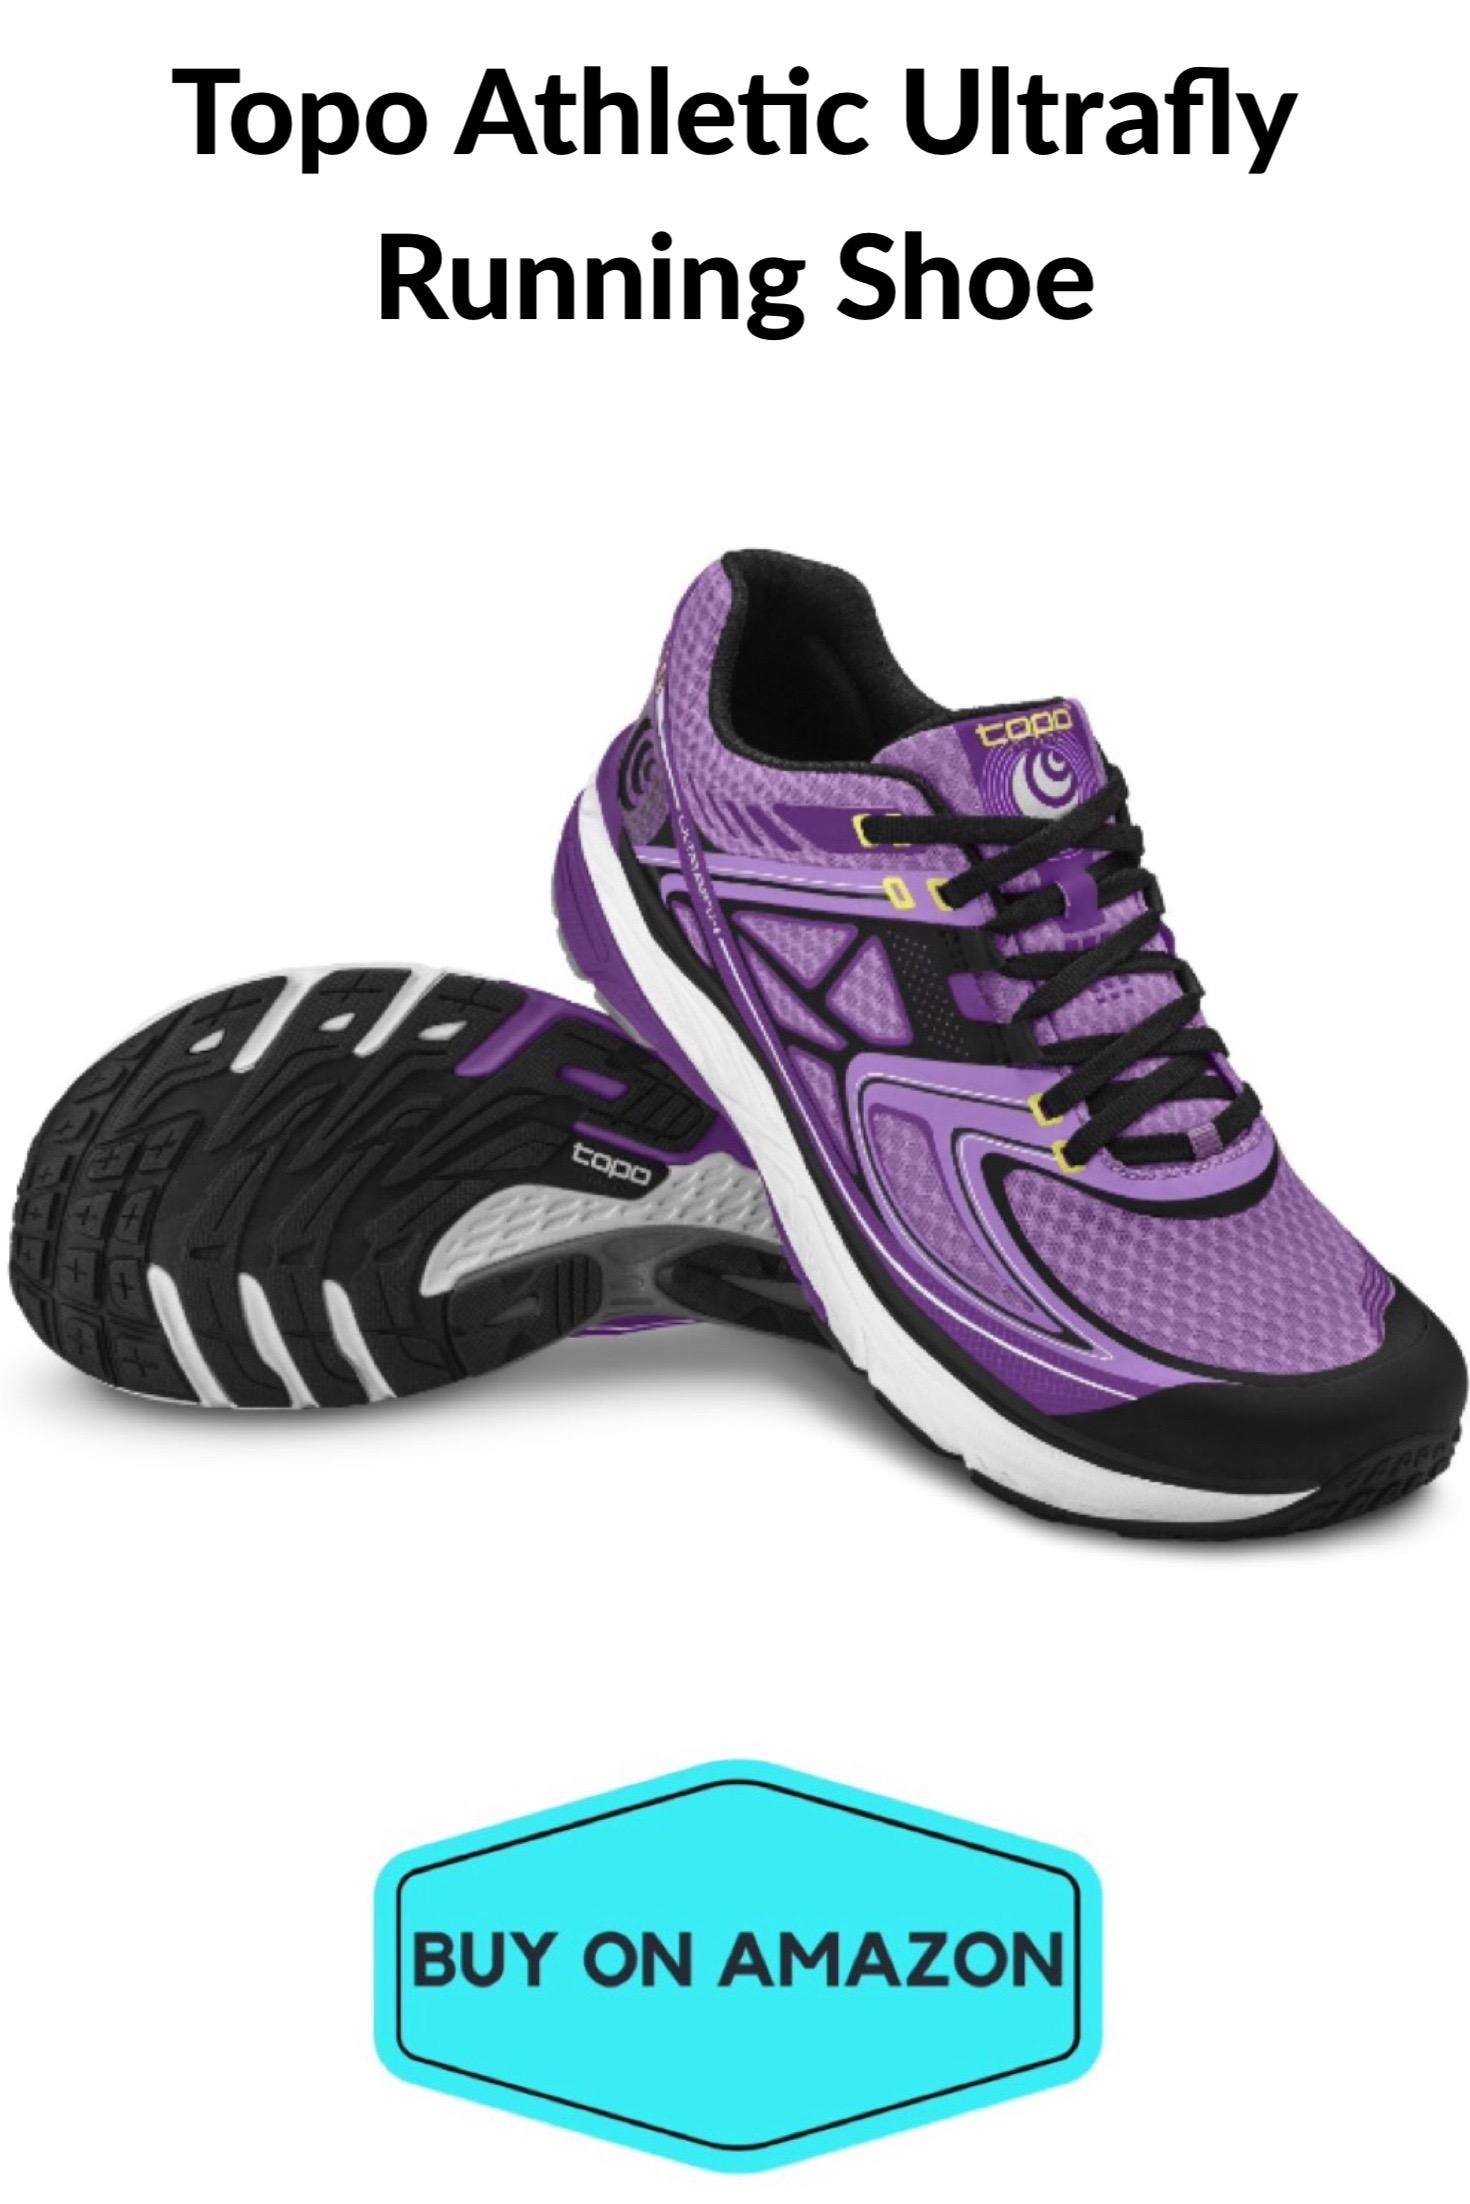 Topo Athletic Ultrafly Women's Running Shoe